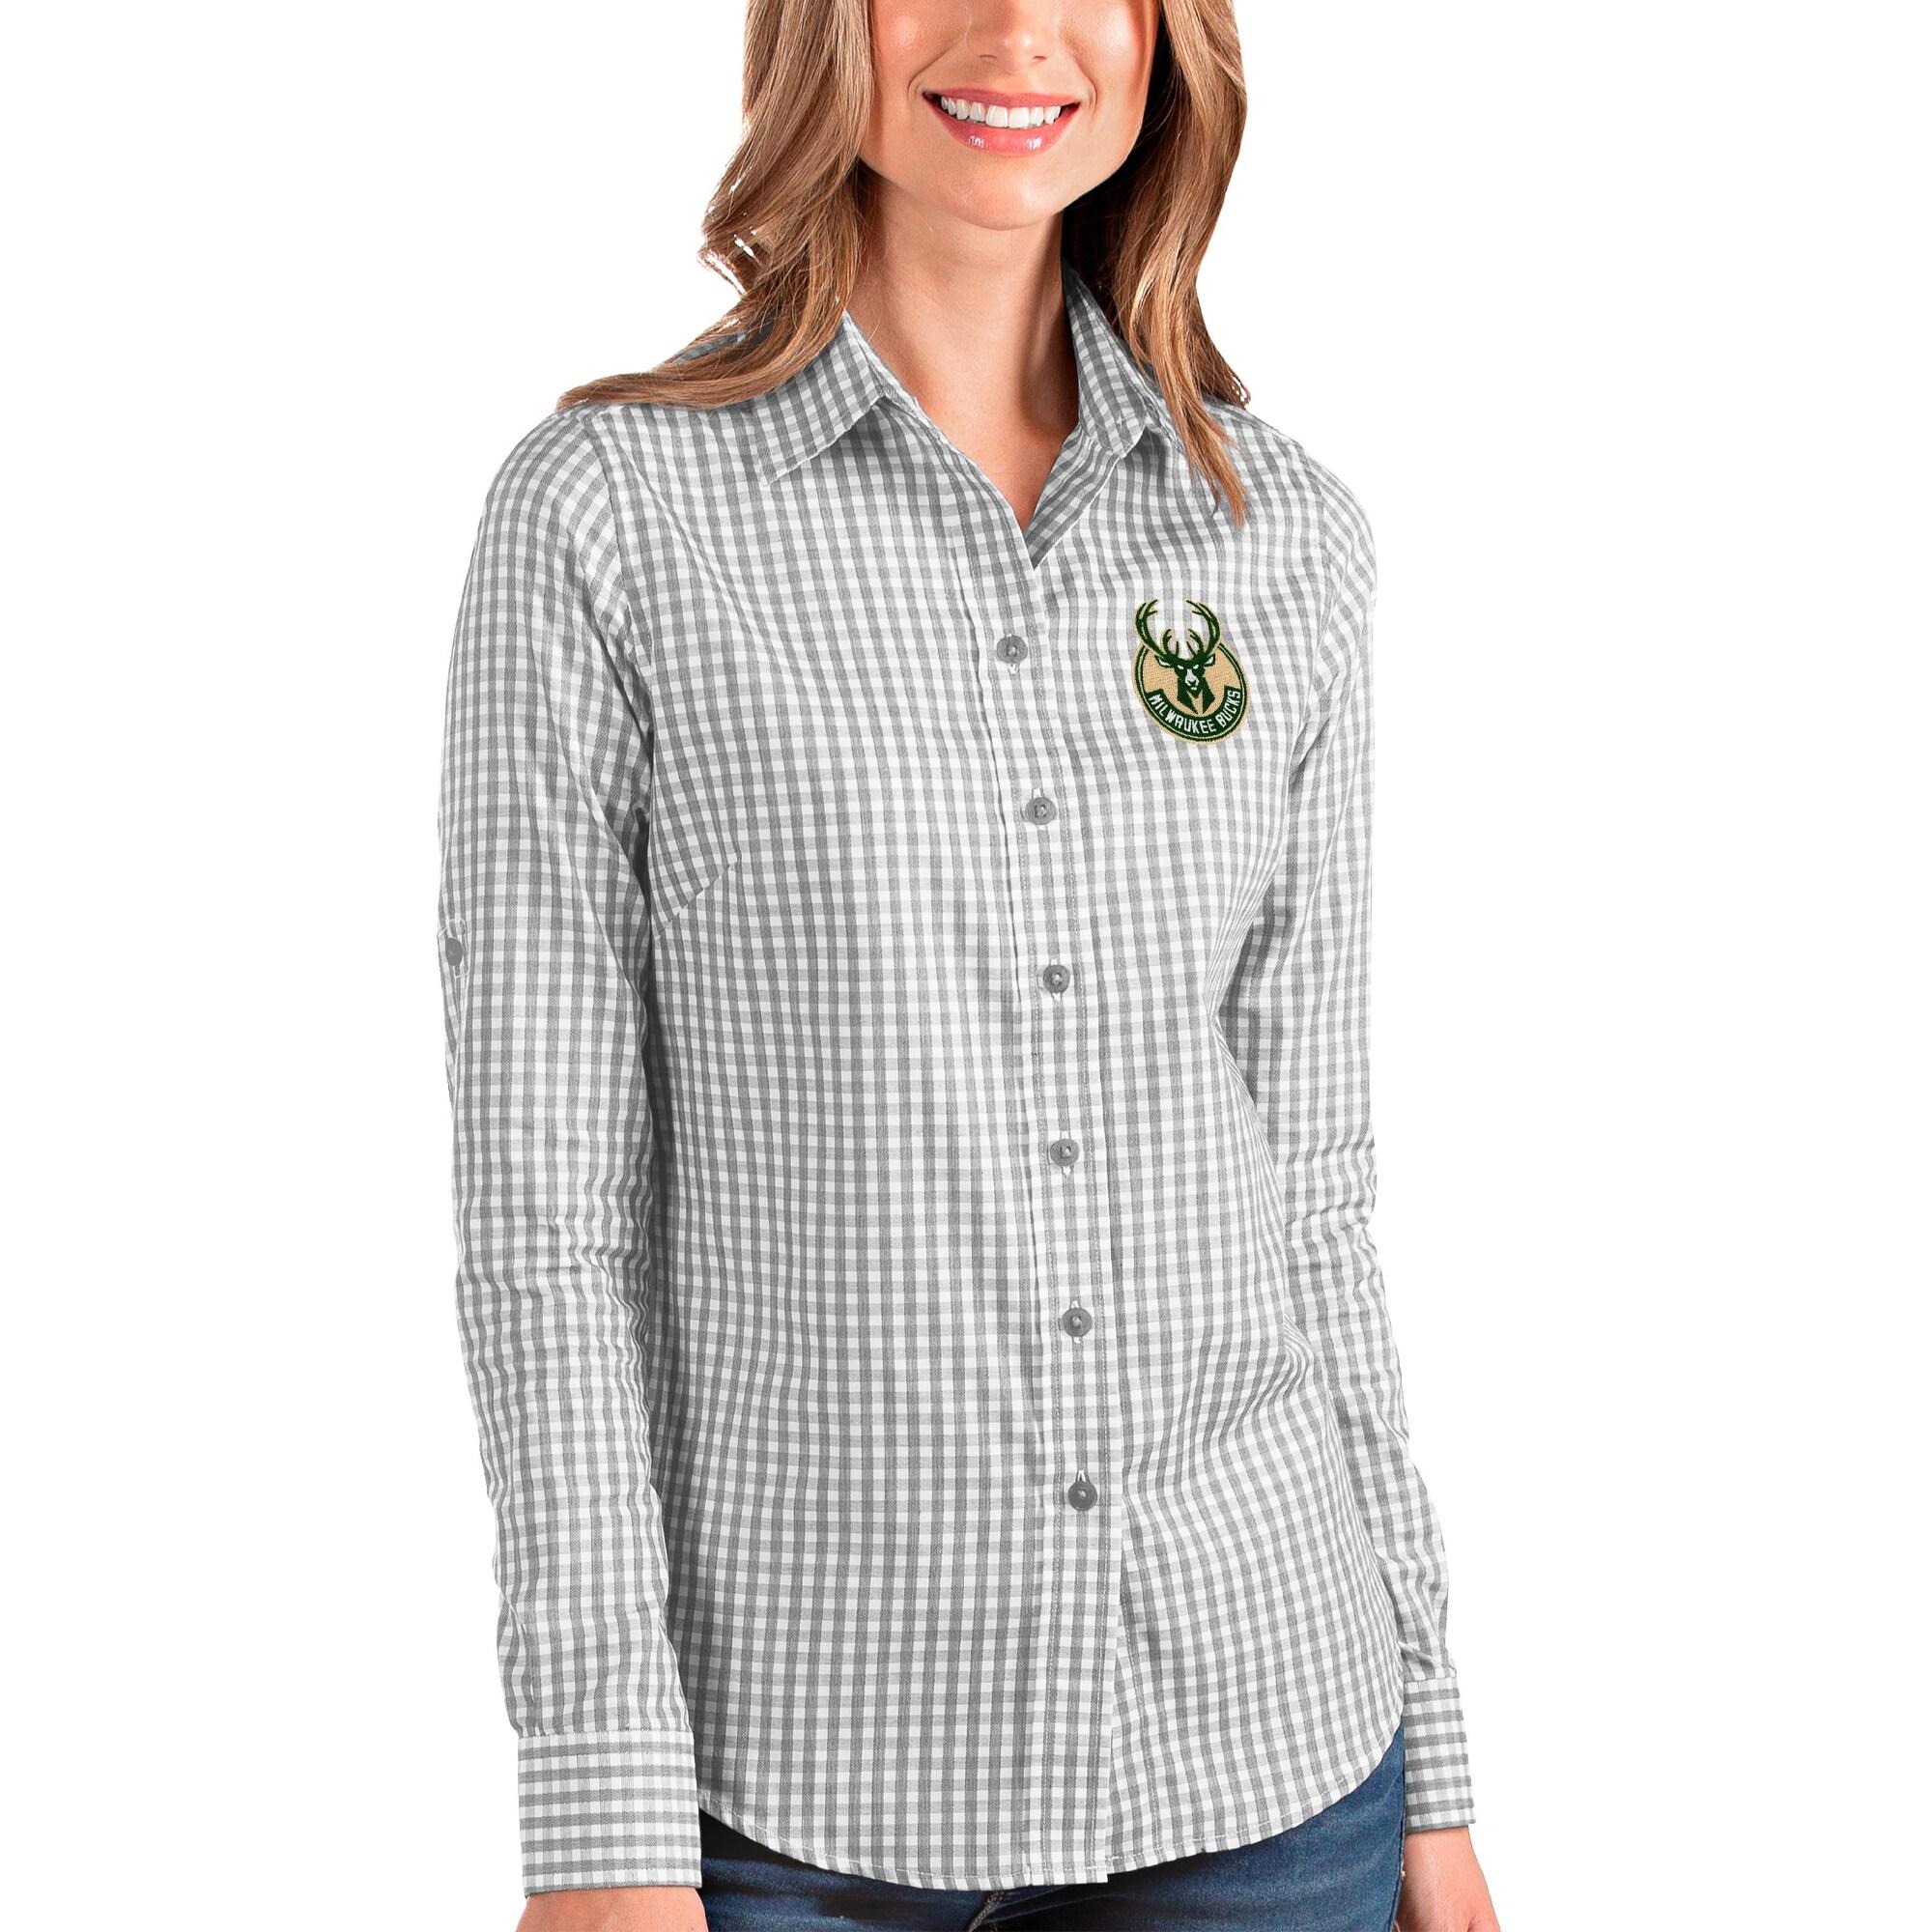 Milwaukee Bucks Antigua Women's Structure Button-Up Long Sleeve Shirt - Charcoal/White